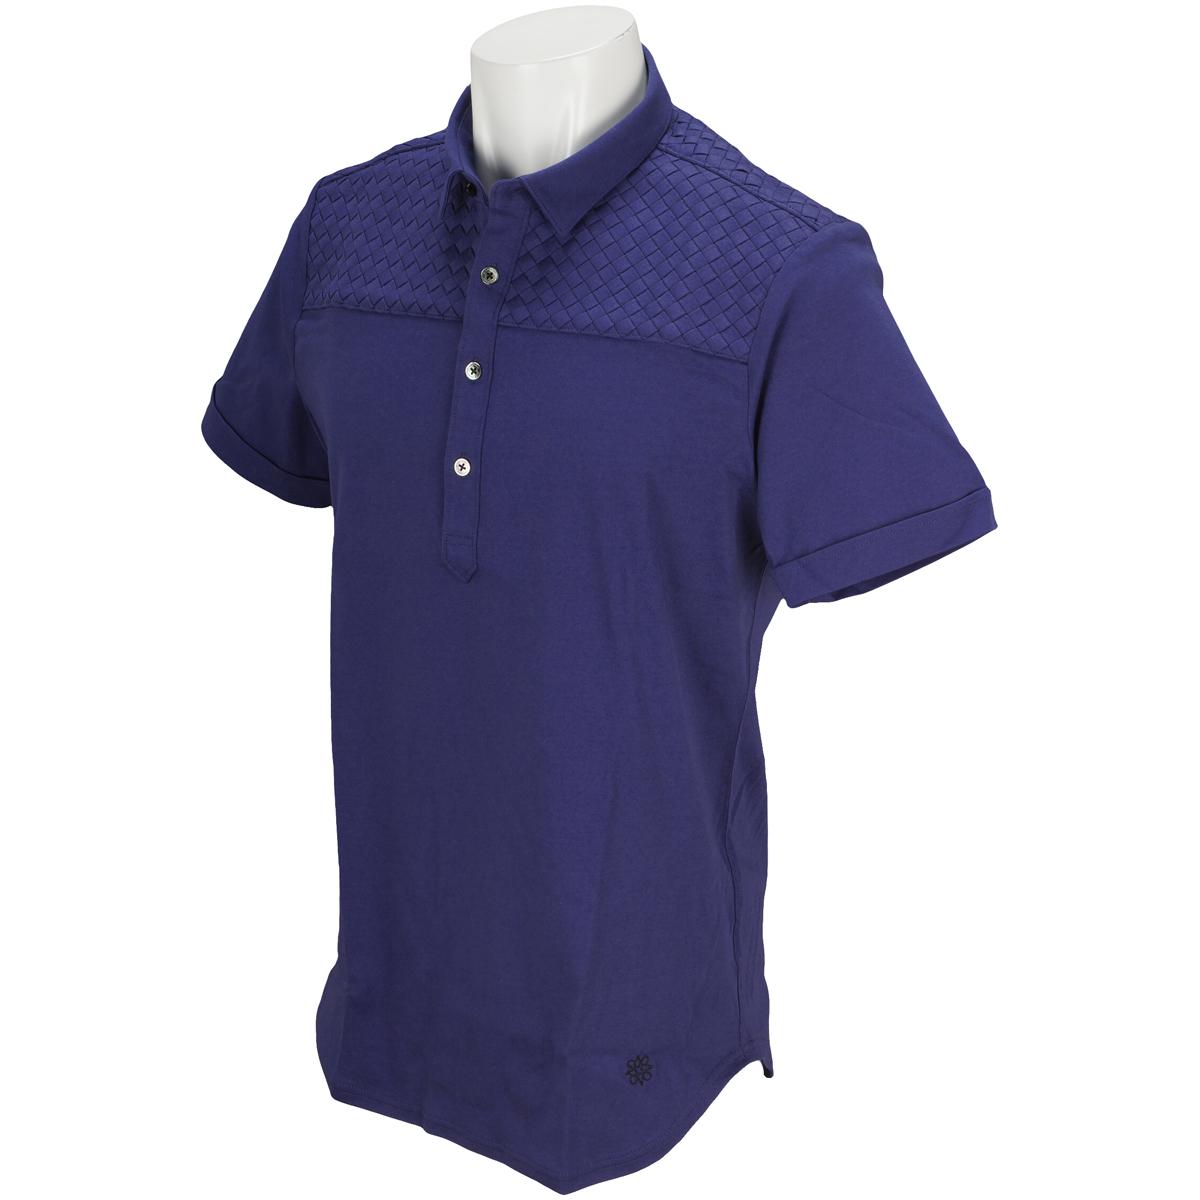 BLK強撚スムースイントレチャート 半袖ポロシャツ